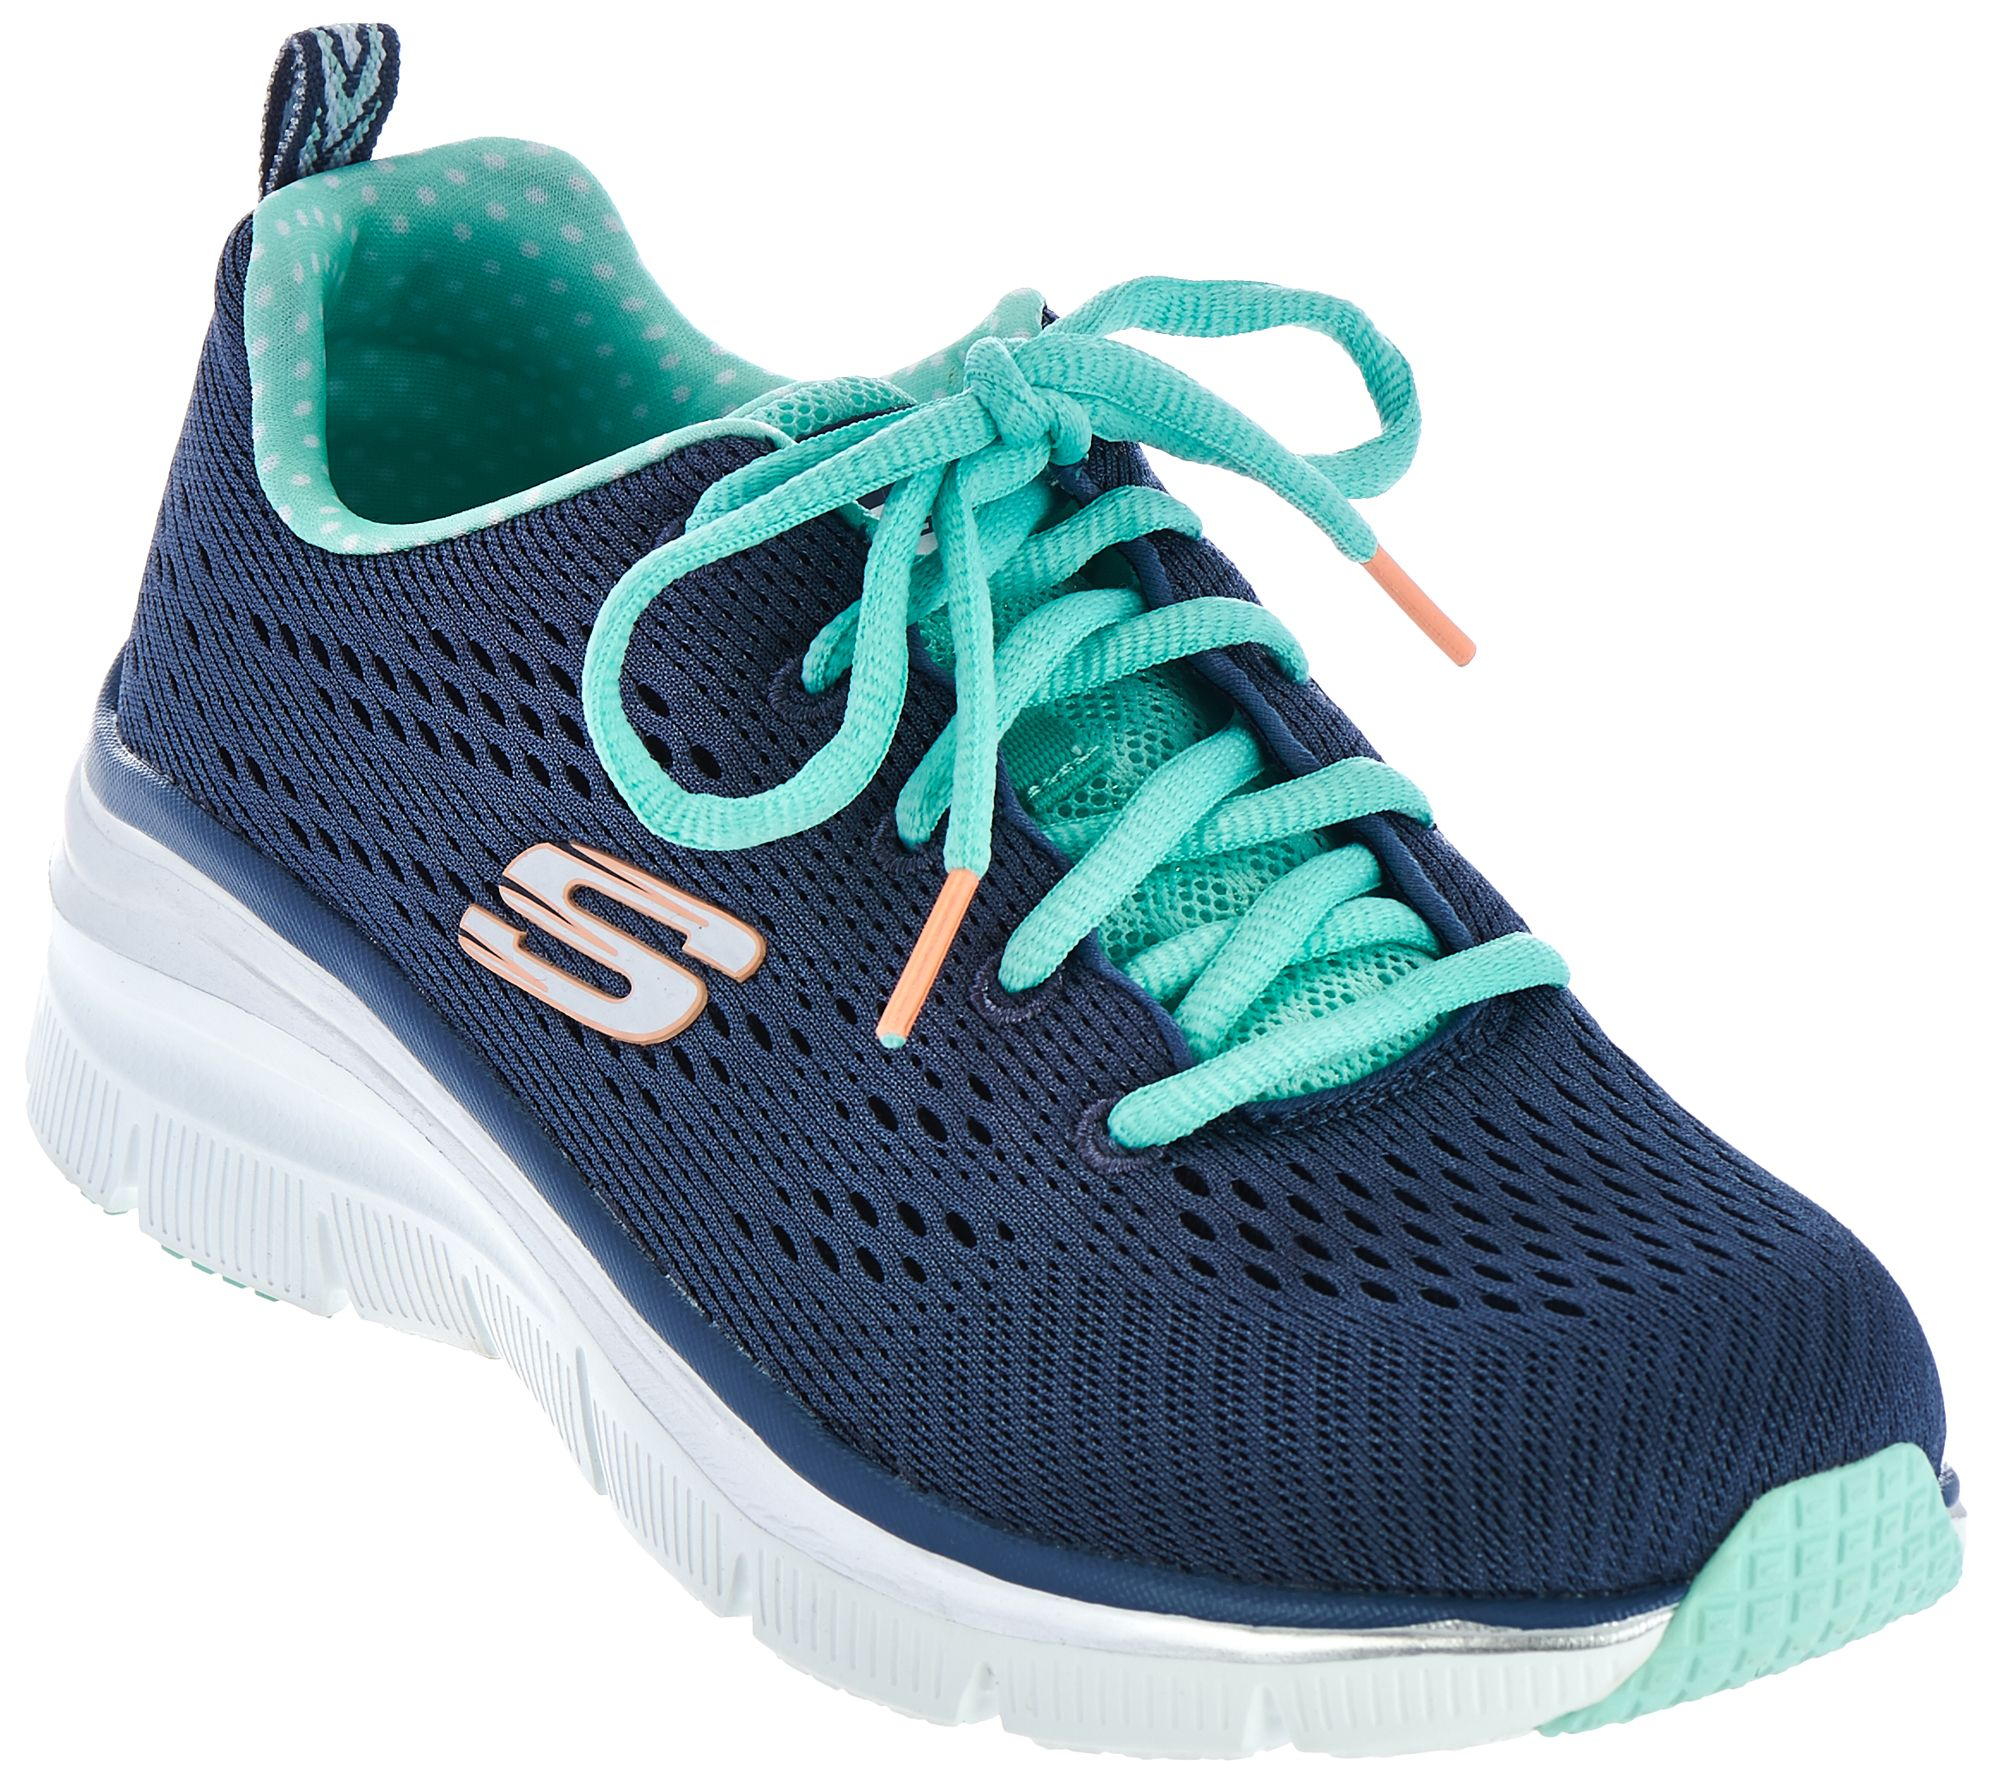 sketchers shoes skechers skech-knit wedge sneakers - statement piece - a281113 UDKXSSL